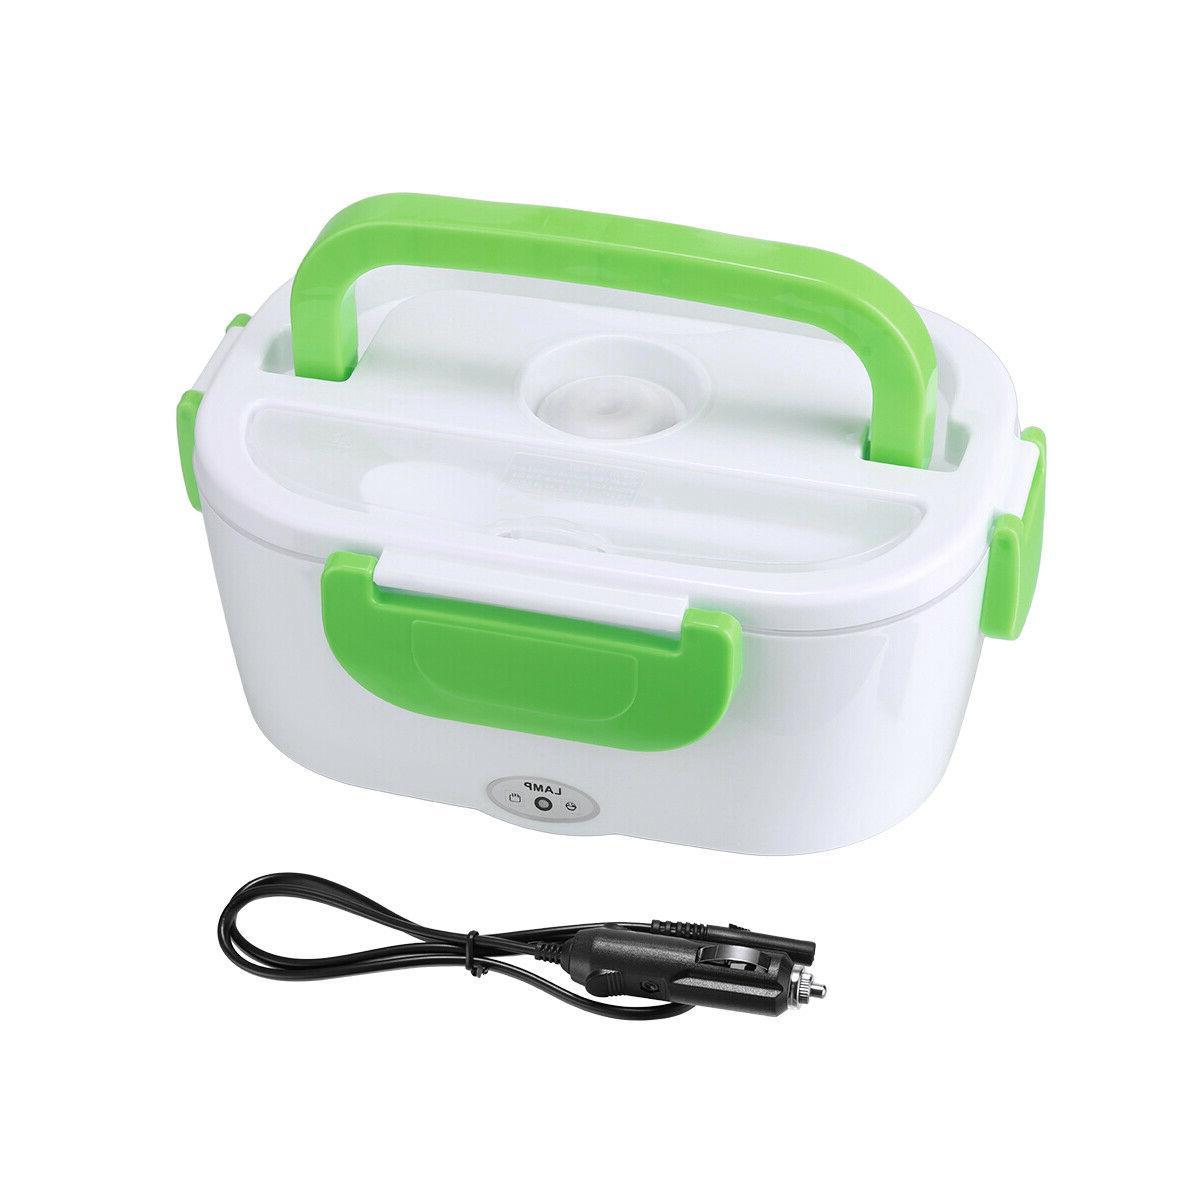 Portable Electric Heated Car Plug Heating Lunch Box Bento Tr